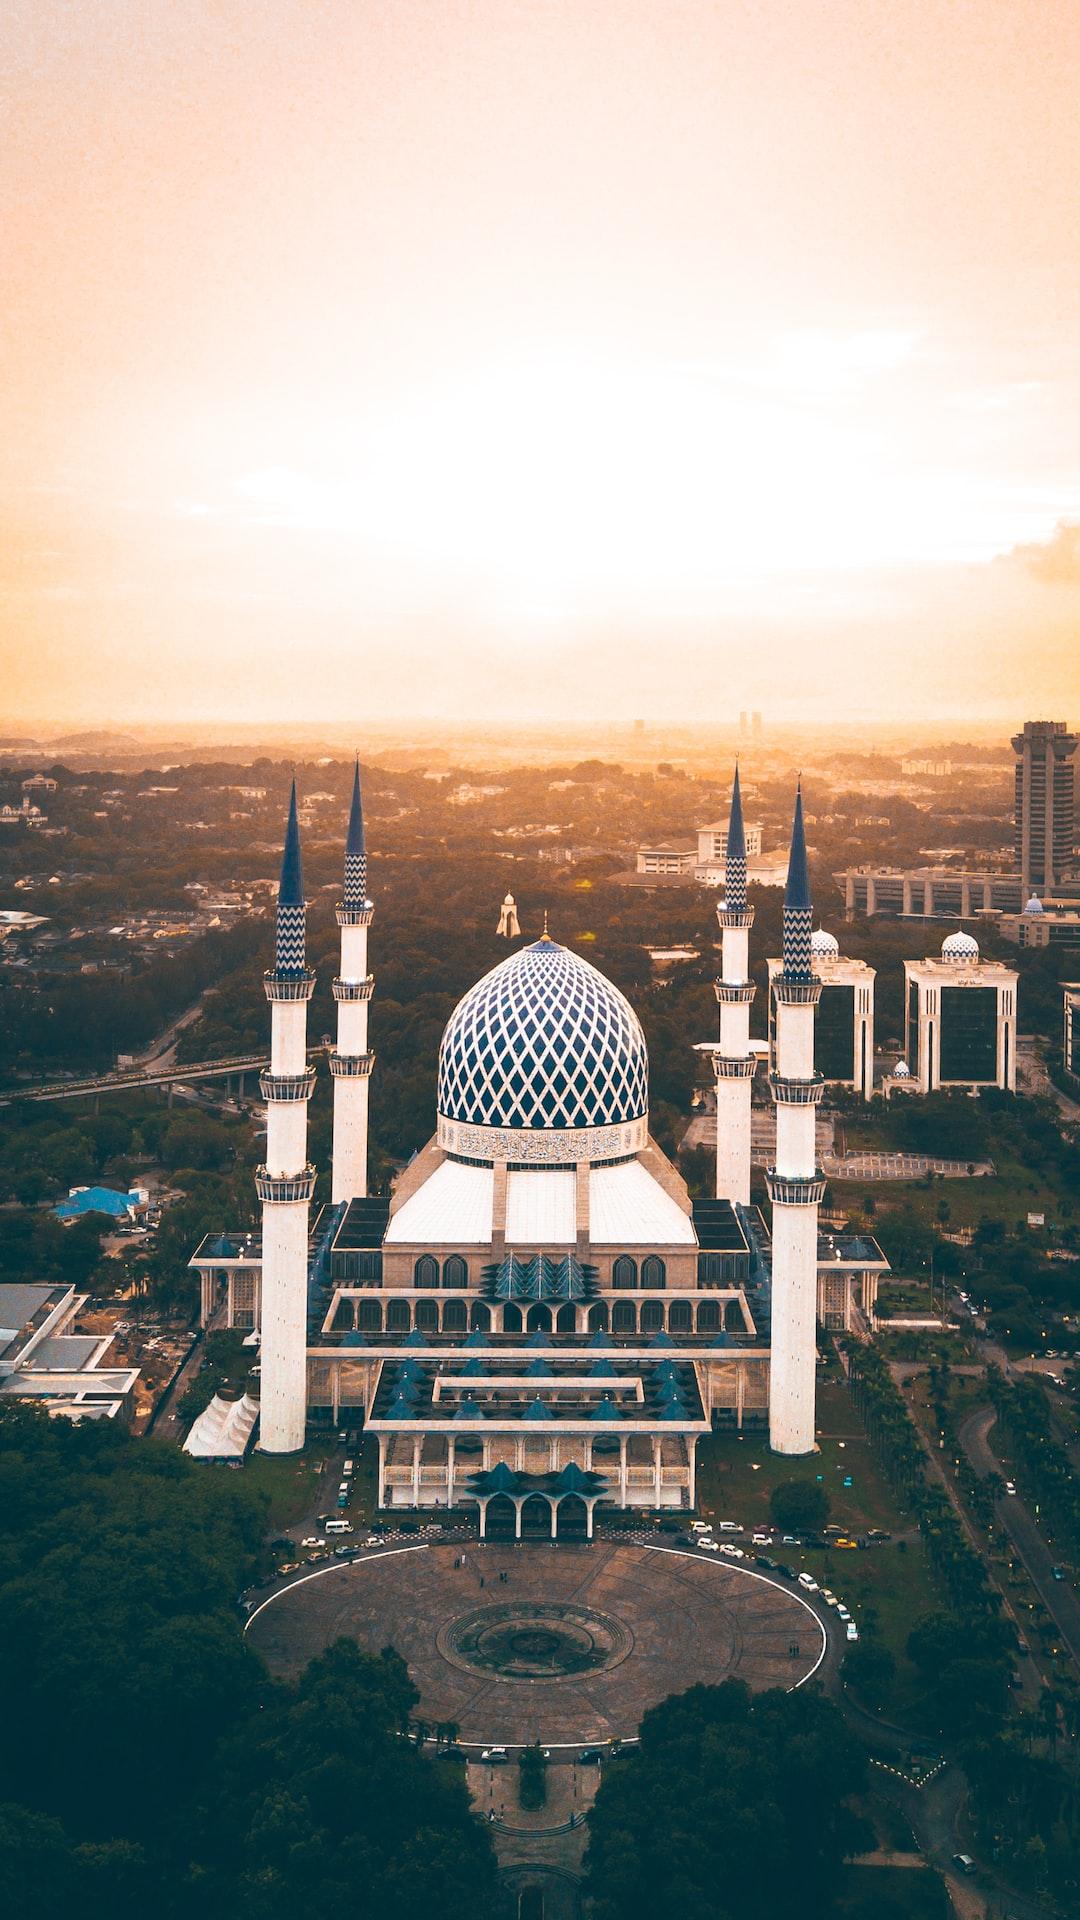 Sultan Salahudin Abdul Aziz Shah Mosque at Sunset